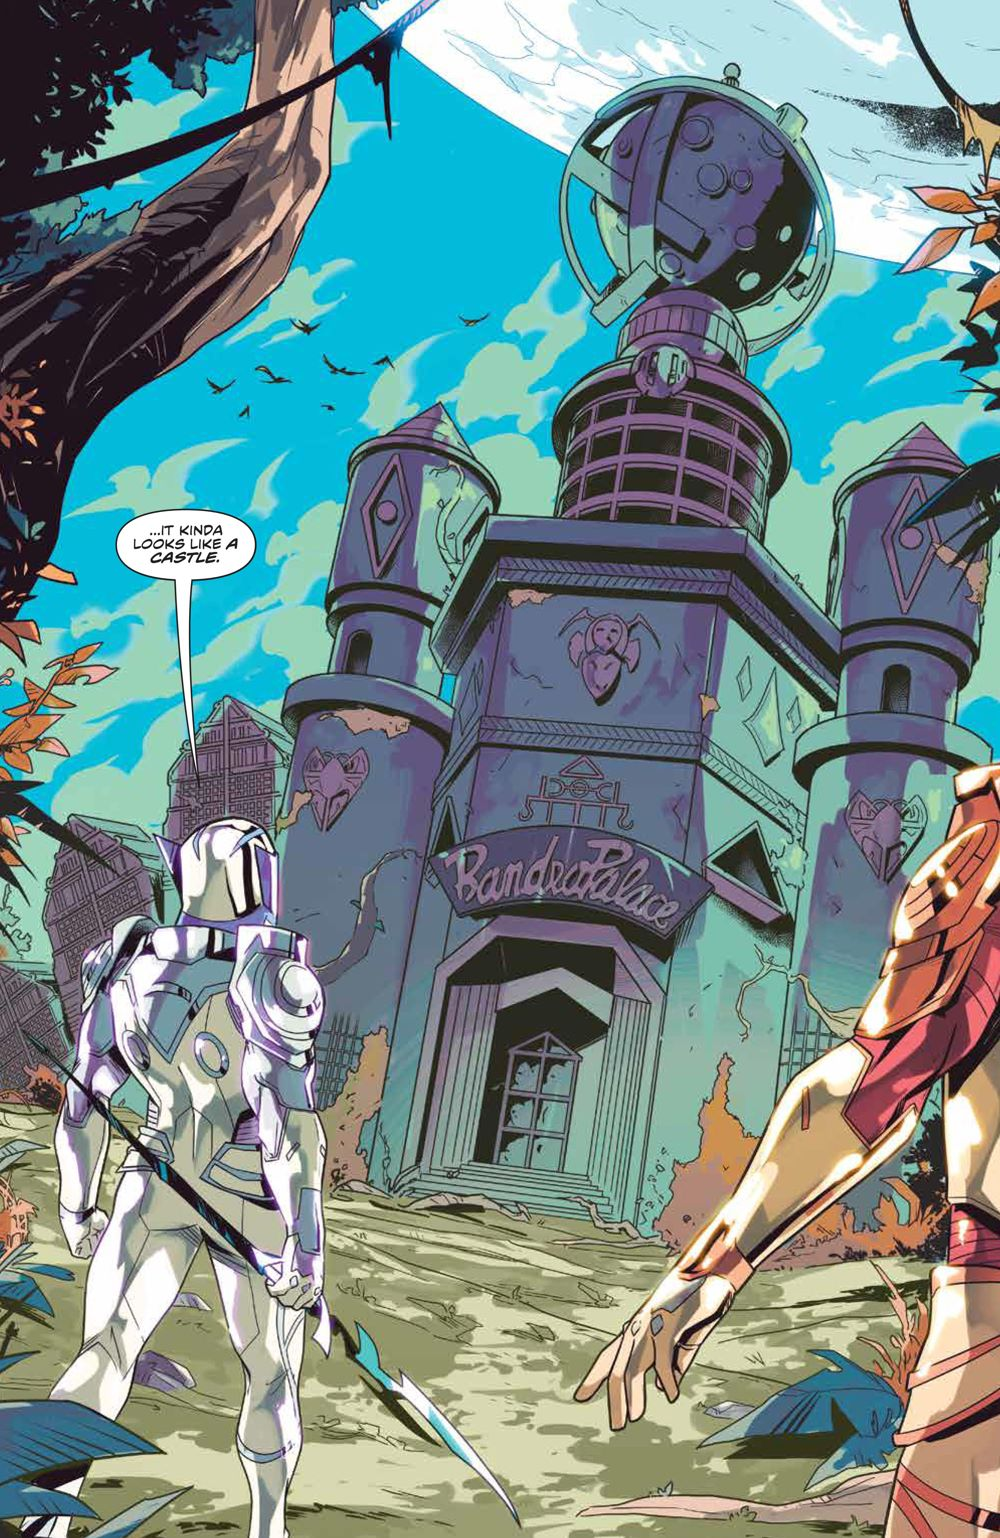 MightyMorphin_006_PRESS_6 ComicList Previews: MIGHTY MORPHIN #6